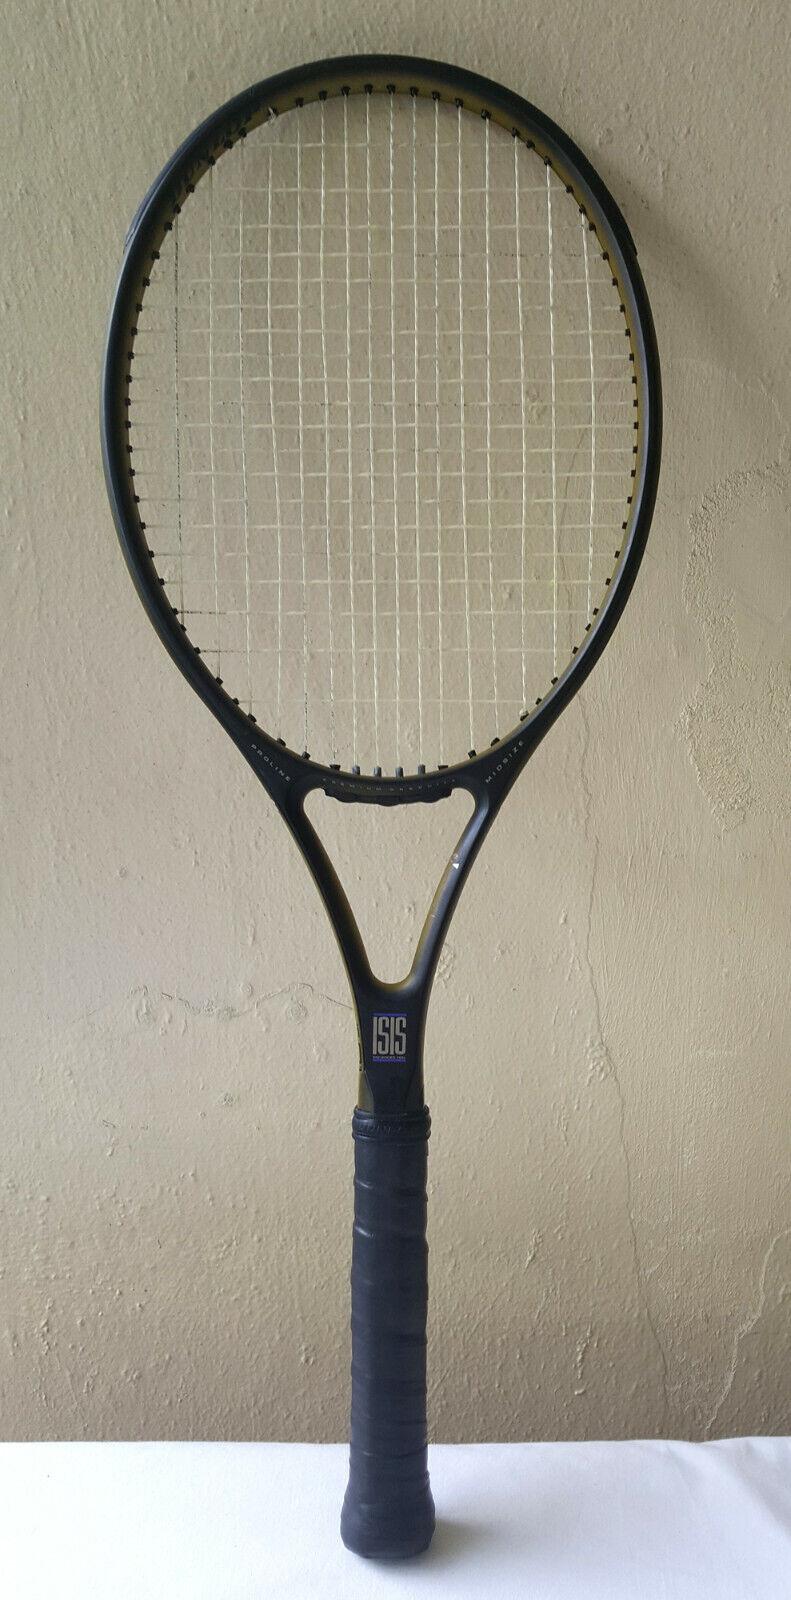 Dunlop Select Pro revelación Premium Grafito tenis raqueta  de tamaño mediano 4 1 8